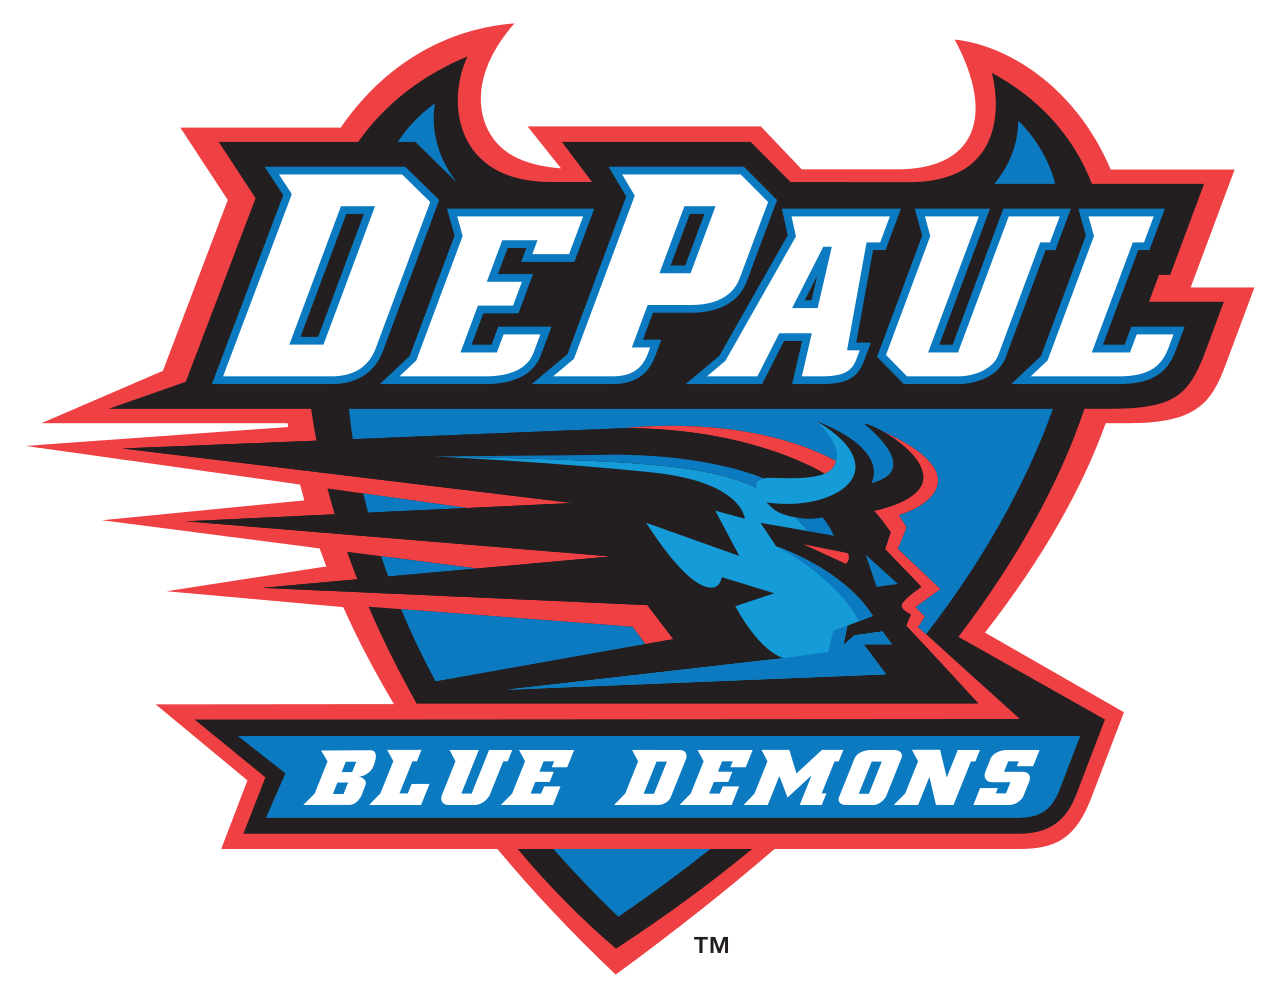 Depaul University Logo Google 検索 Mascot Branding And